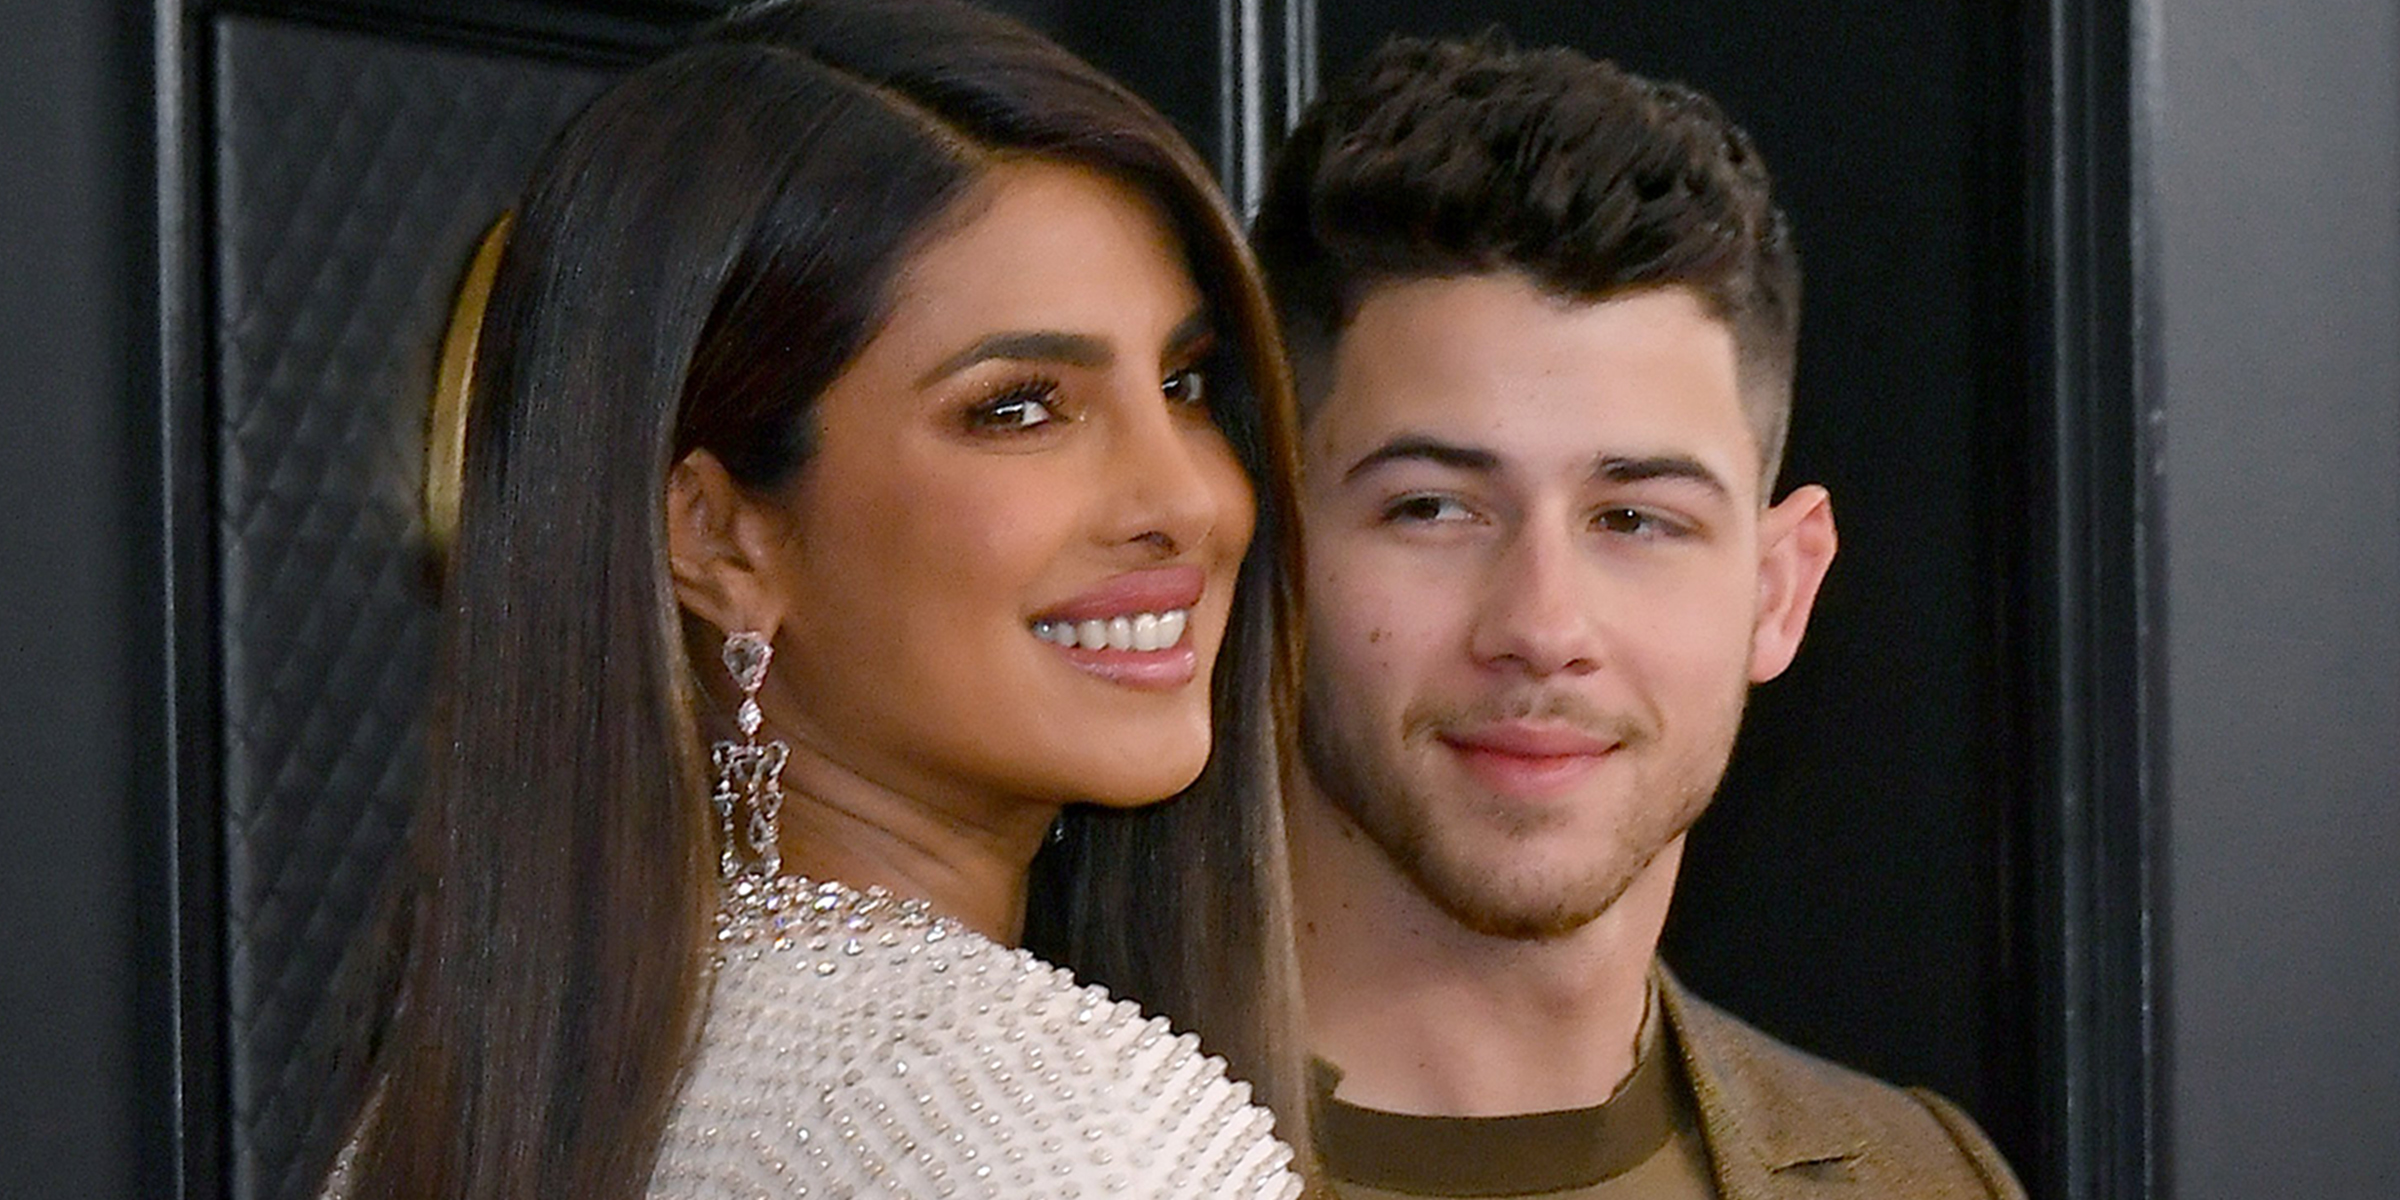 Priyanka Chopra, Nick Jonas pay tribute to Kobe Bryant at the Grammys